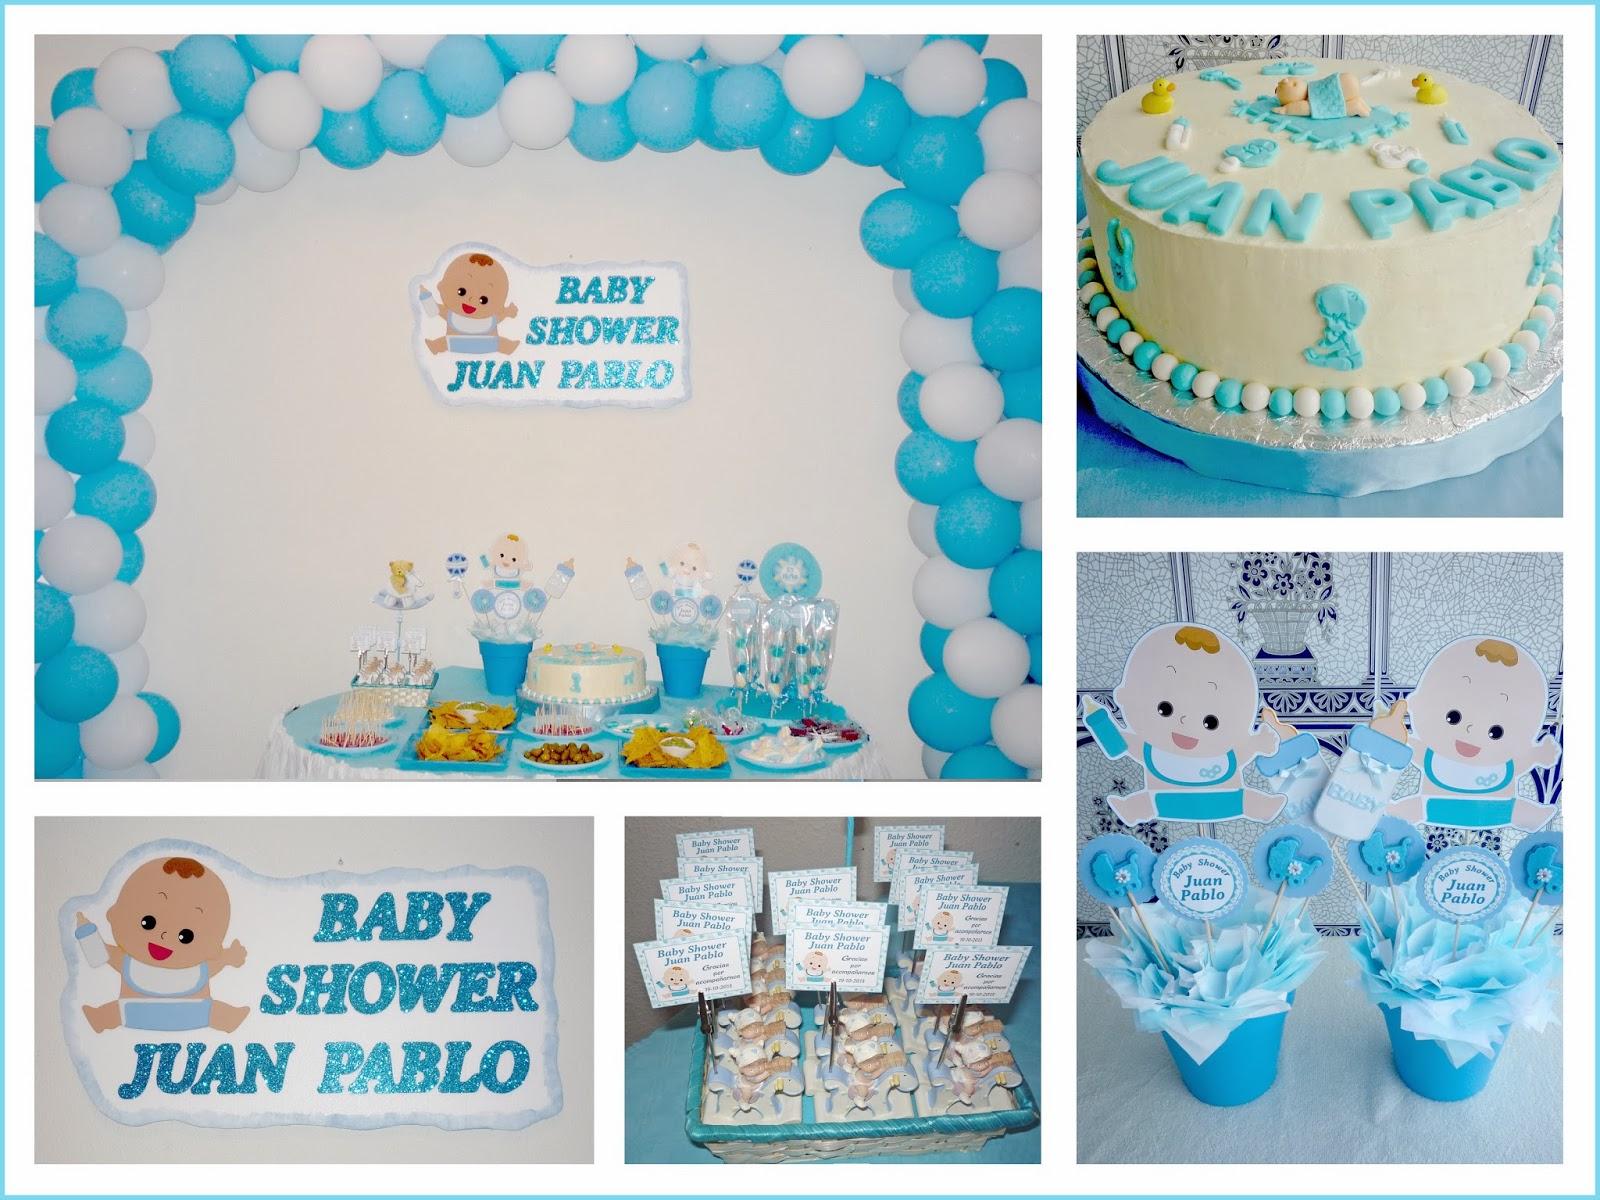 Baby nina fiestas baby shower para juan pablo for Fiesta baby shower decoracion